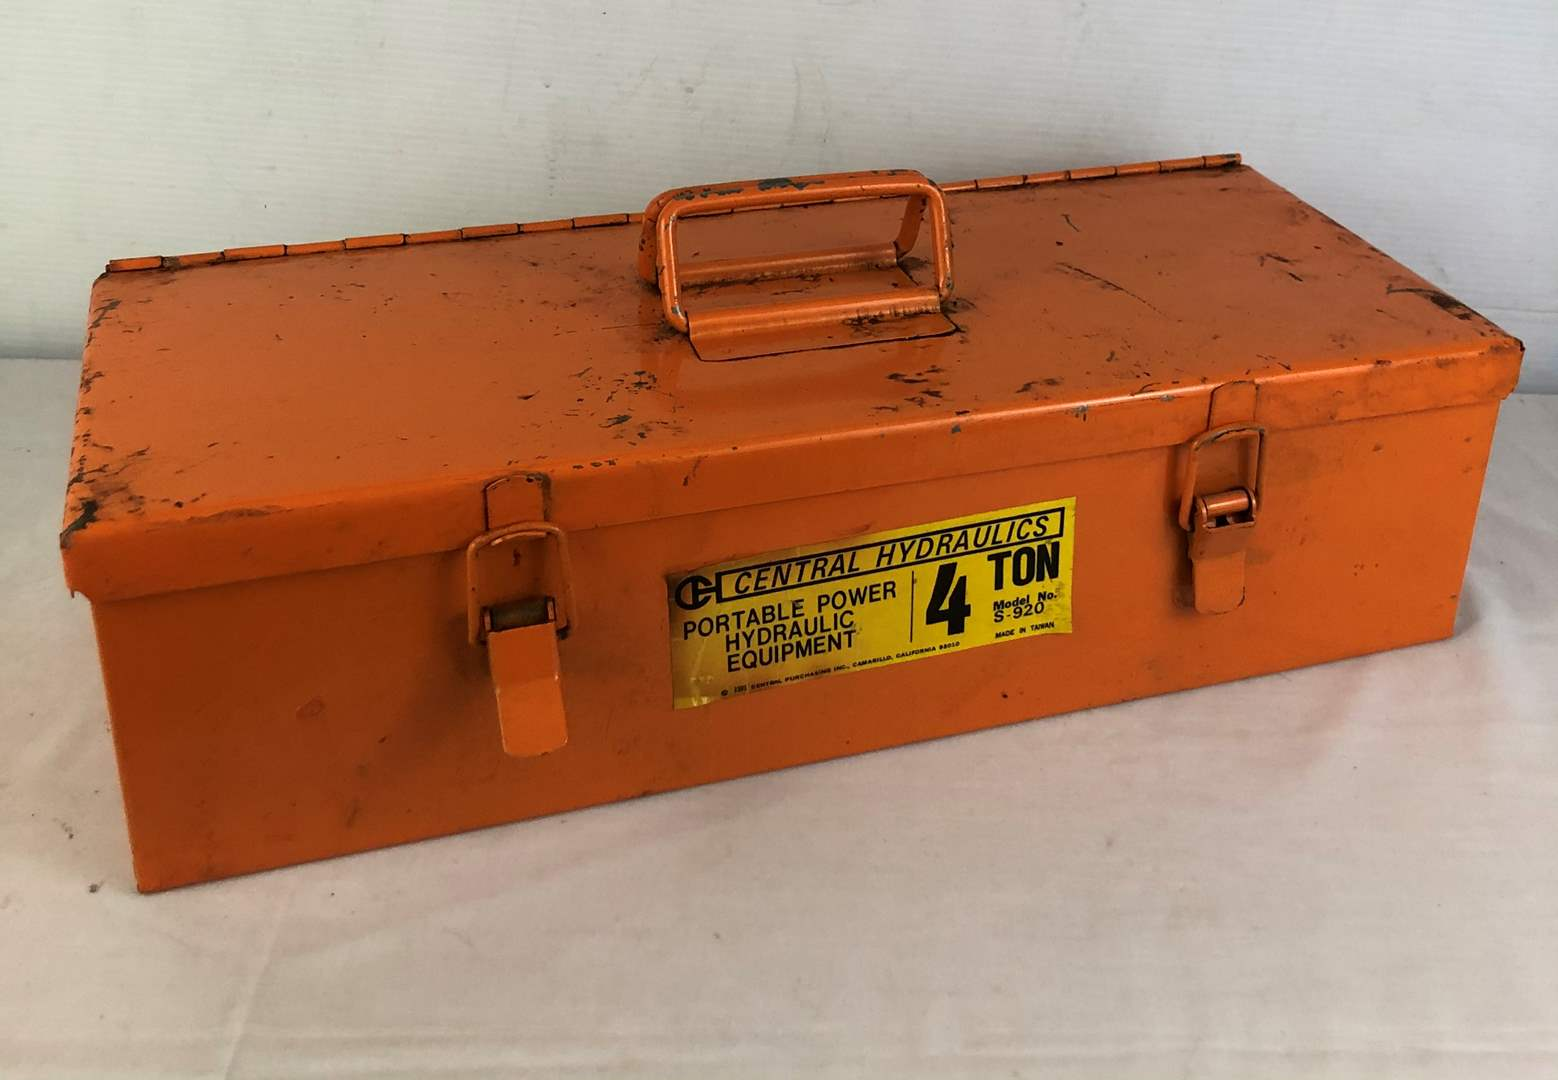 Lot # 154 - 4 Ton Portable Hydraulic Equipment Kit (main image)